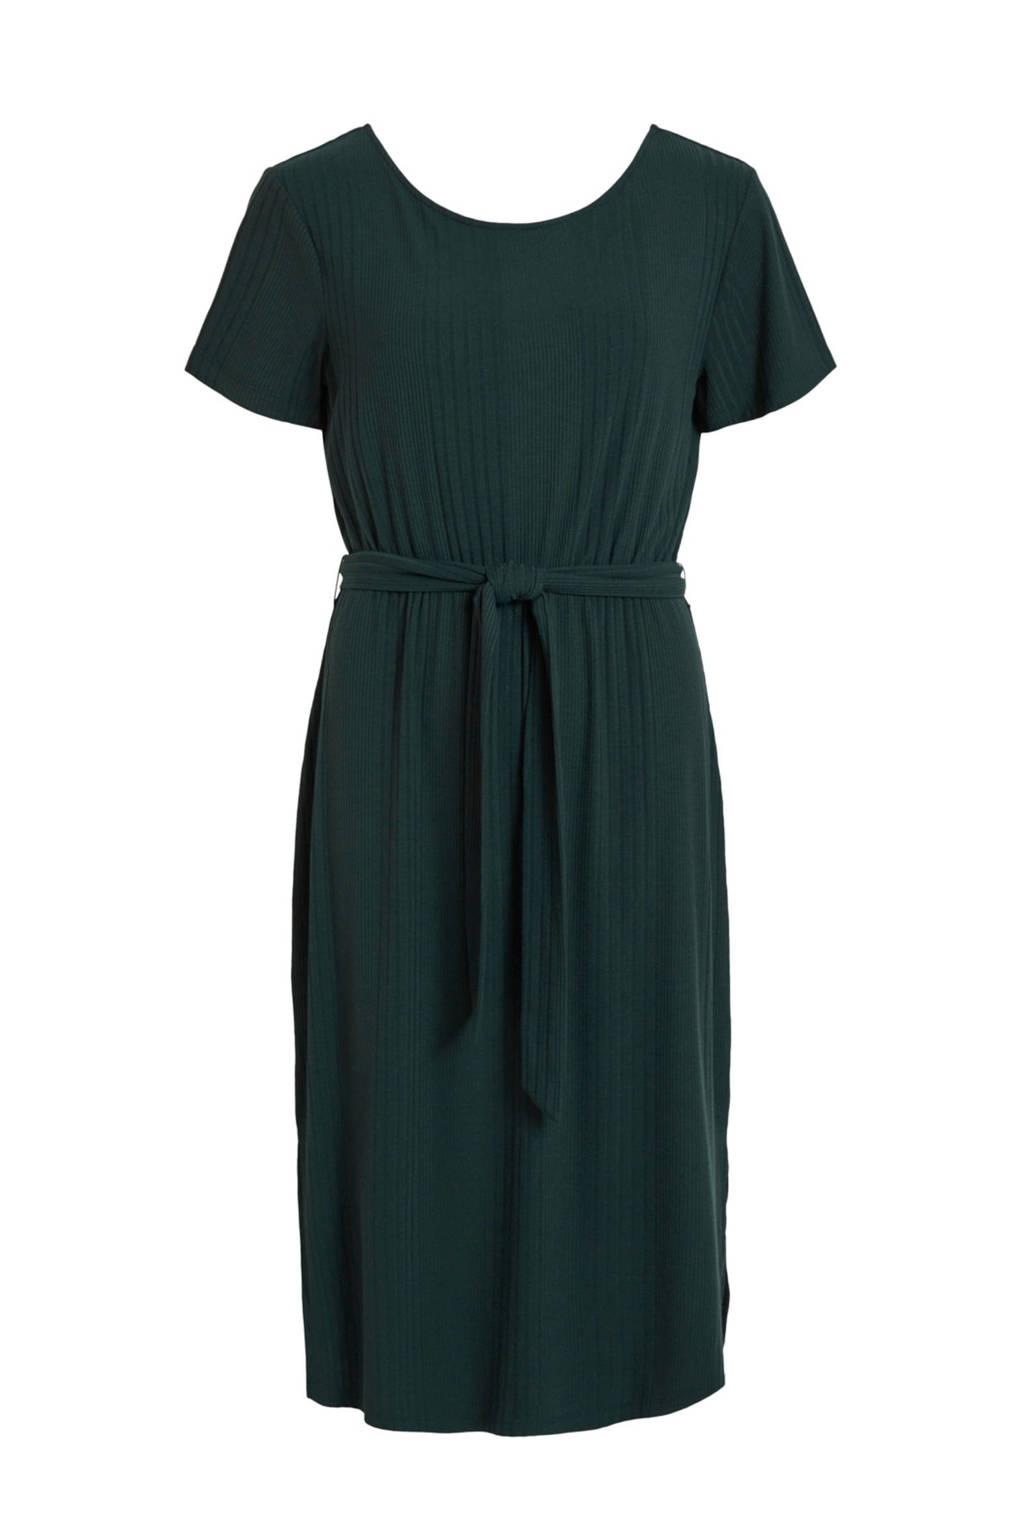 OBJECT jurk met ceintuur groen, Groen